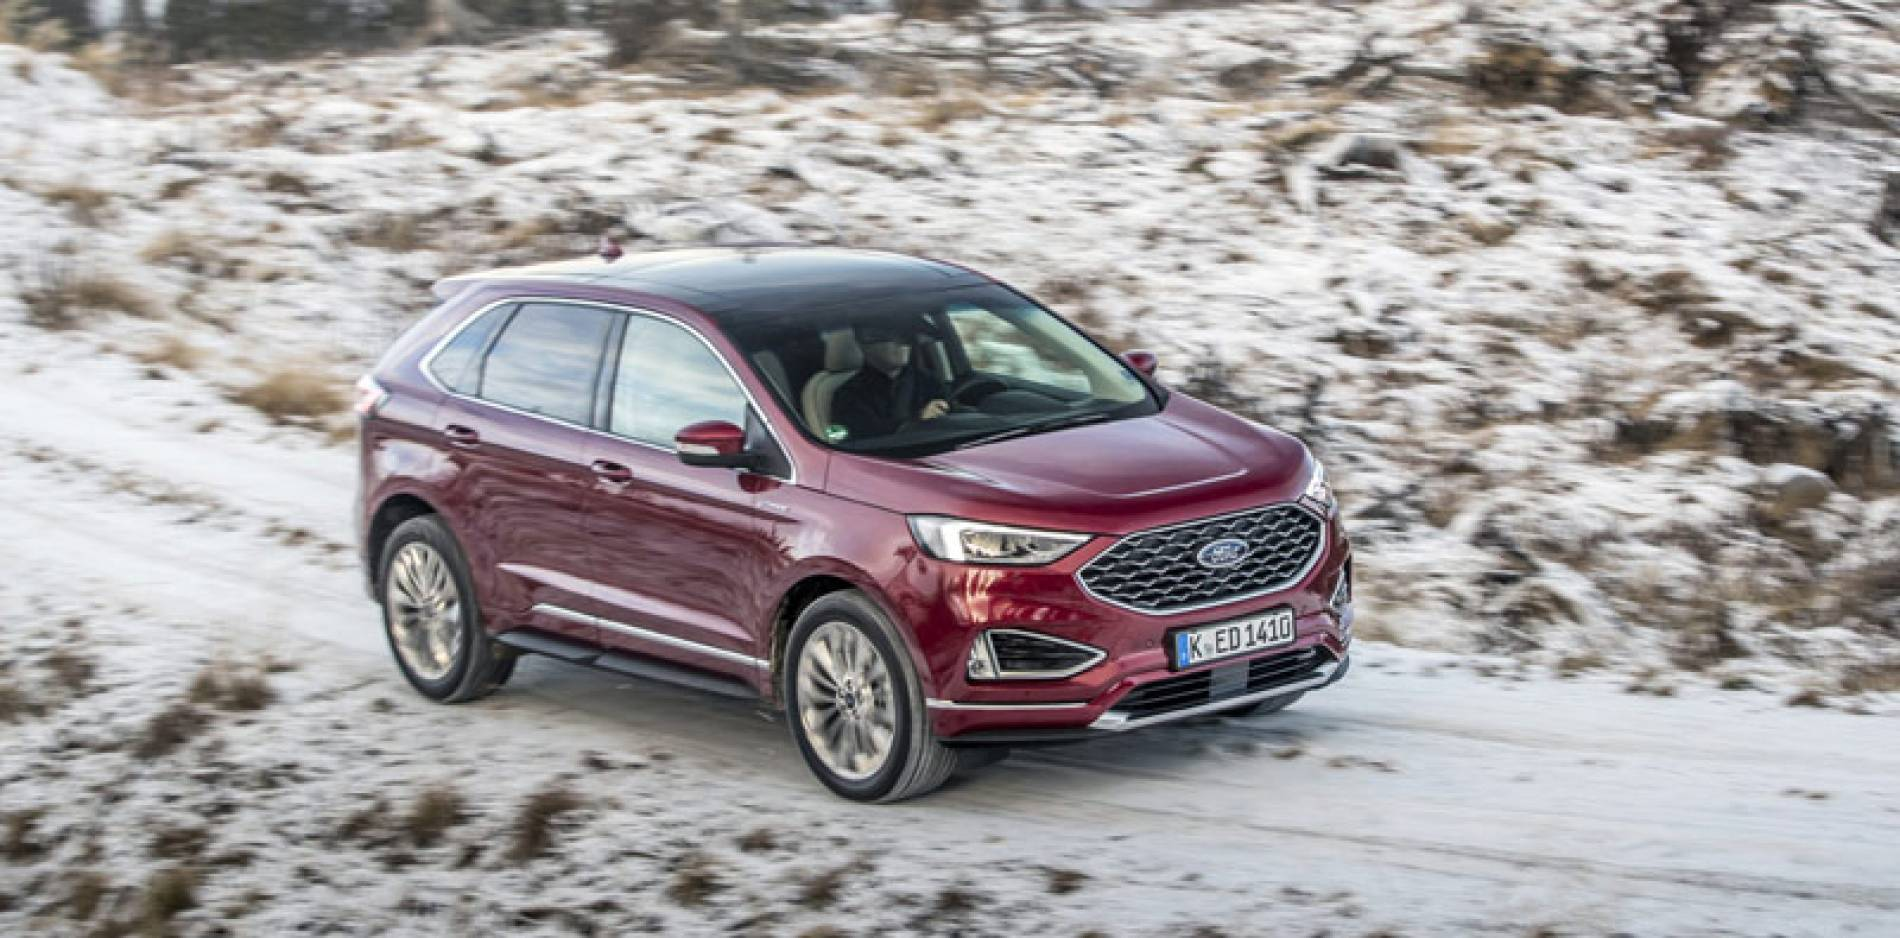 Ford Edge, estilo americano para conquistar las carreteras europeas